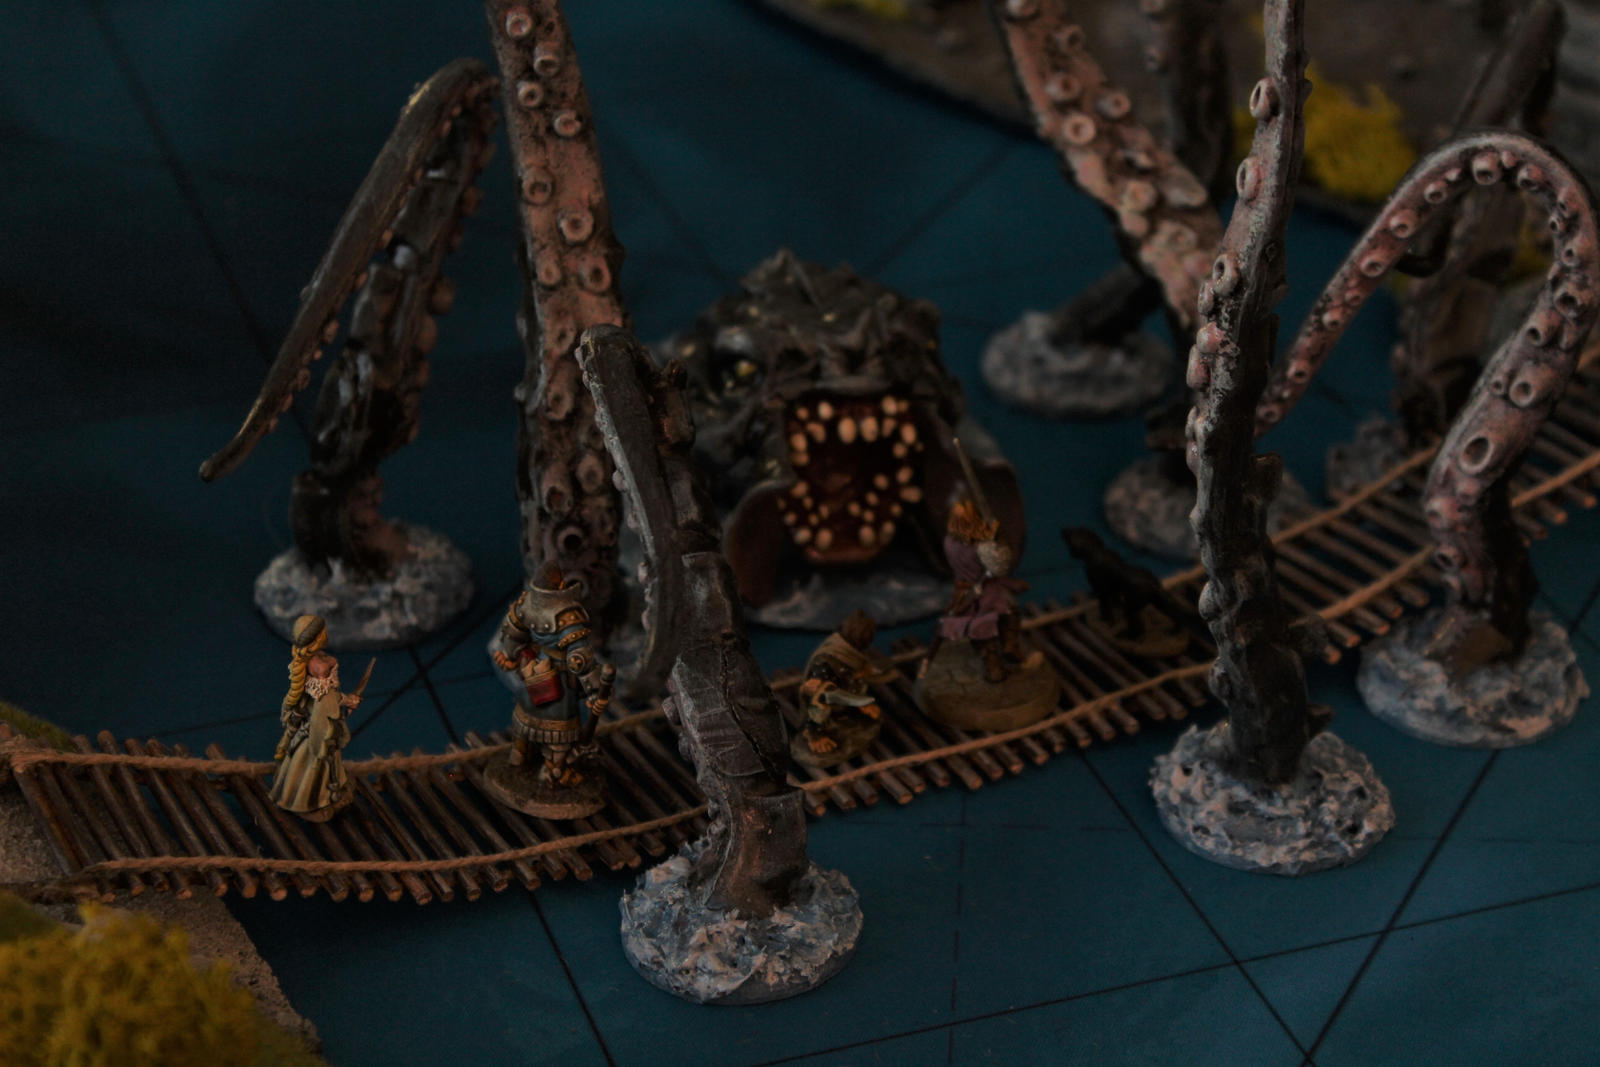 Pathfinder Harrowing Demon's Fen bridge by MrVergee